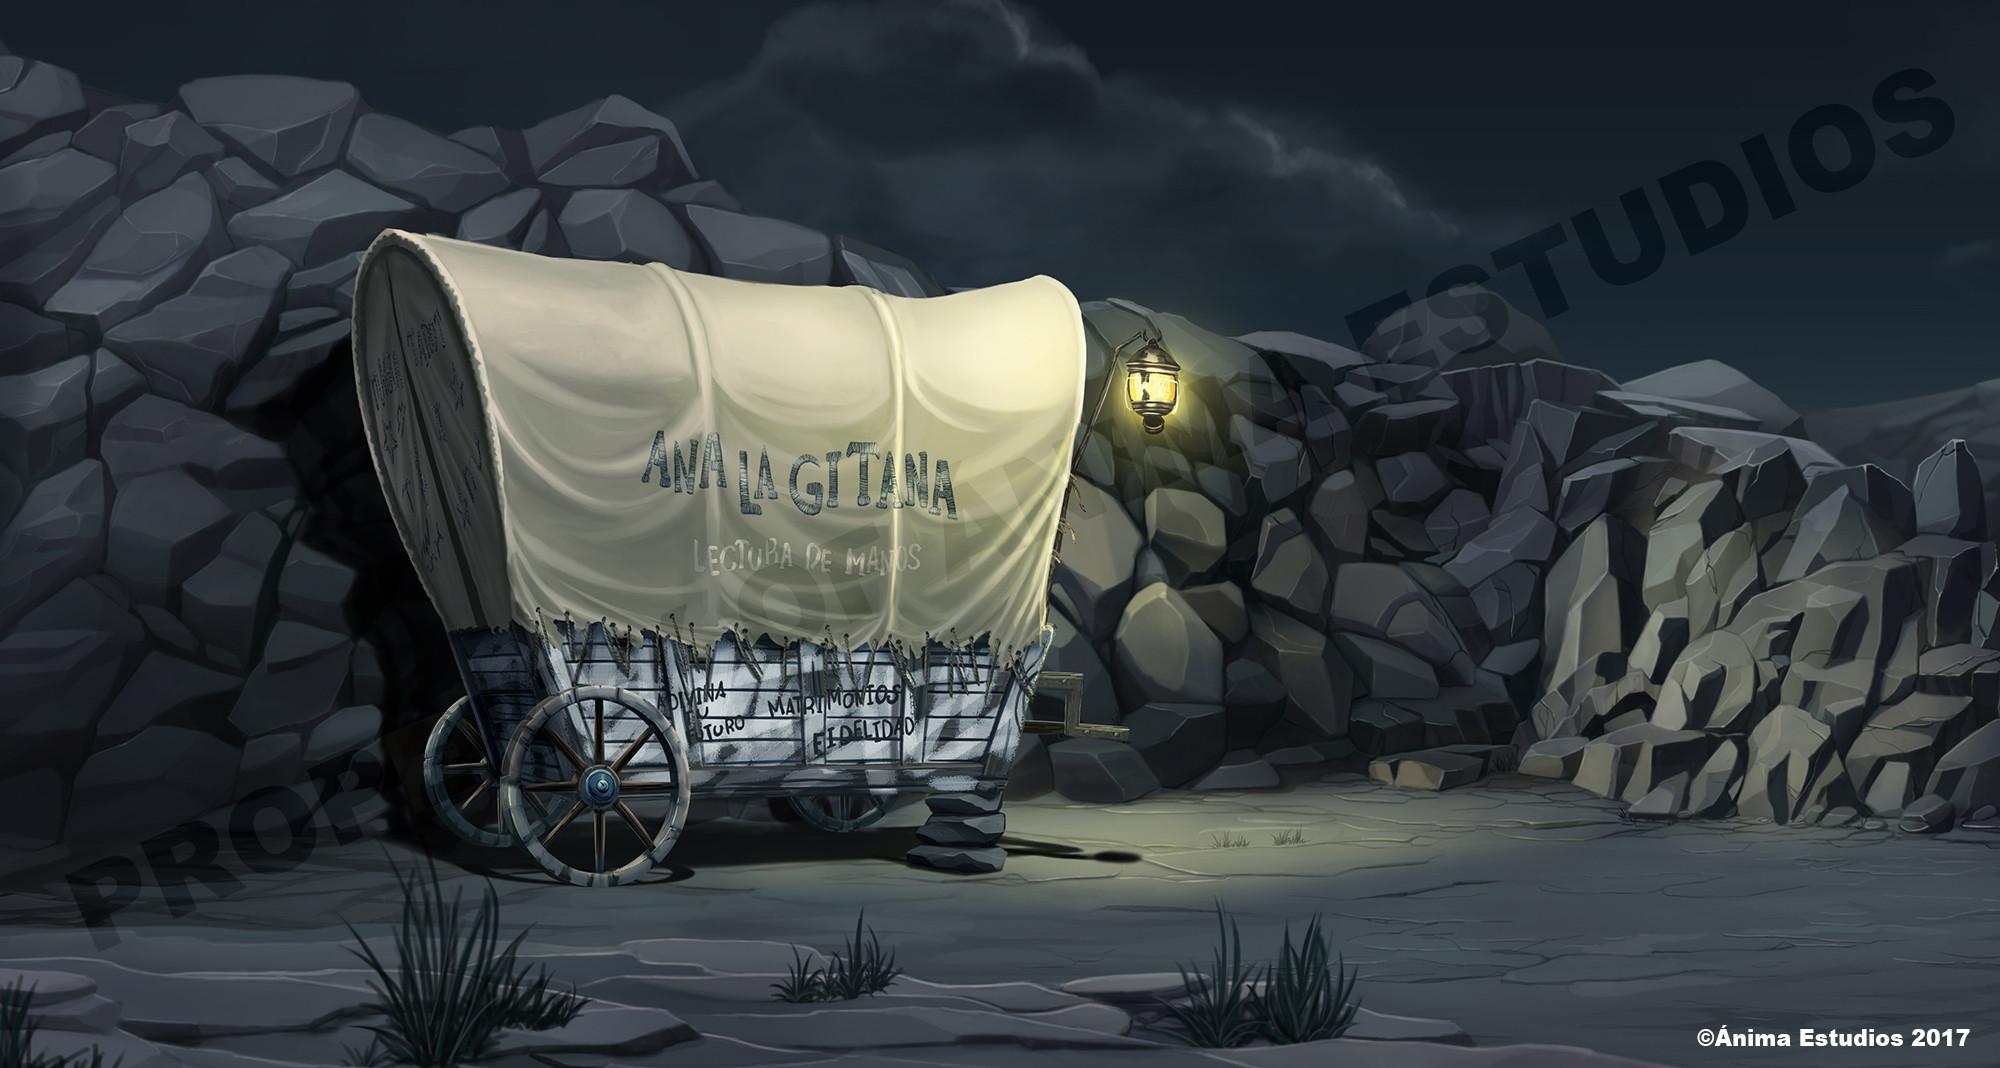 The broken wagon.